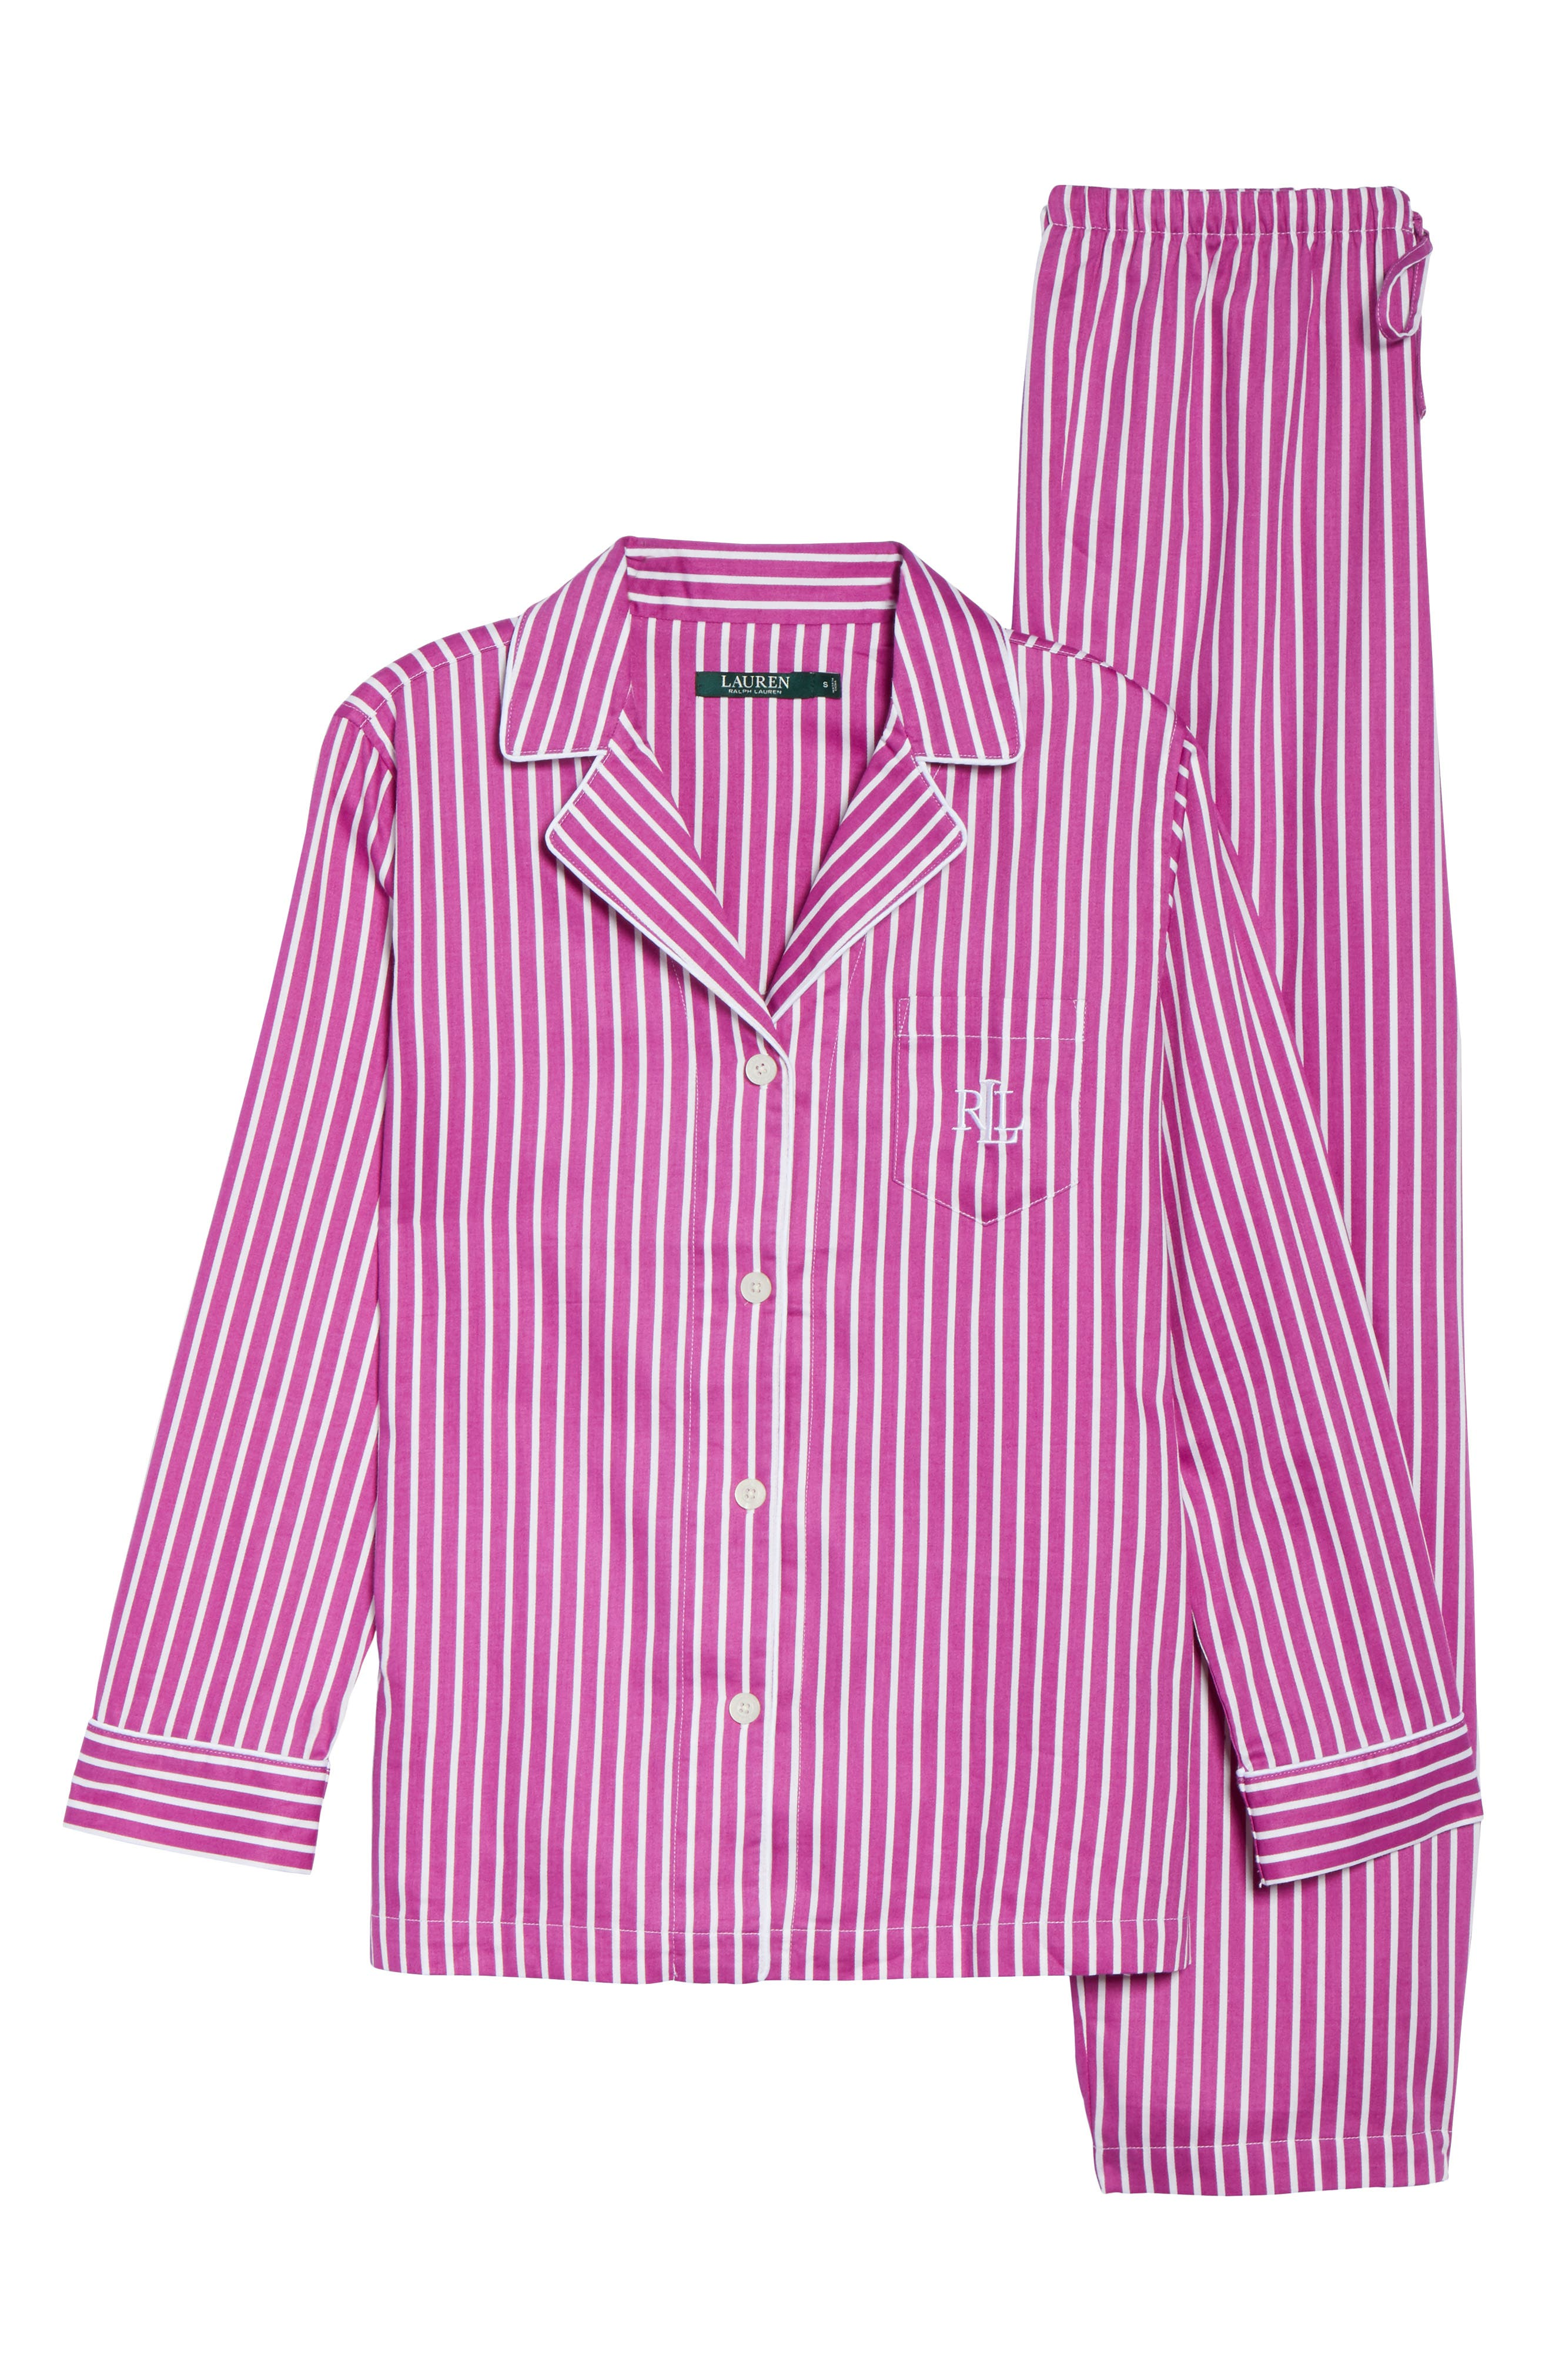 Notch Collar Pajamas,                             Alternate thumbnail 6, color,                             Pink/ White Stripe